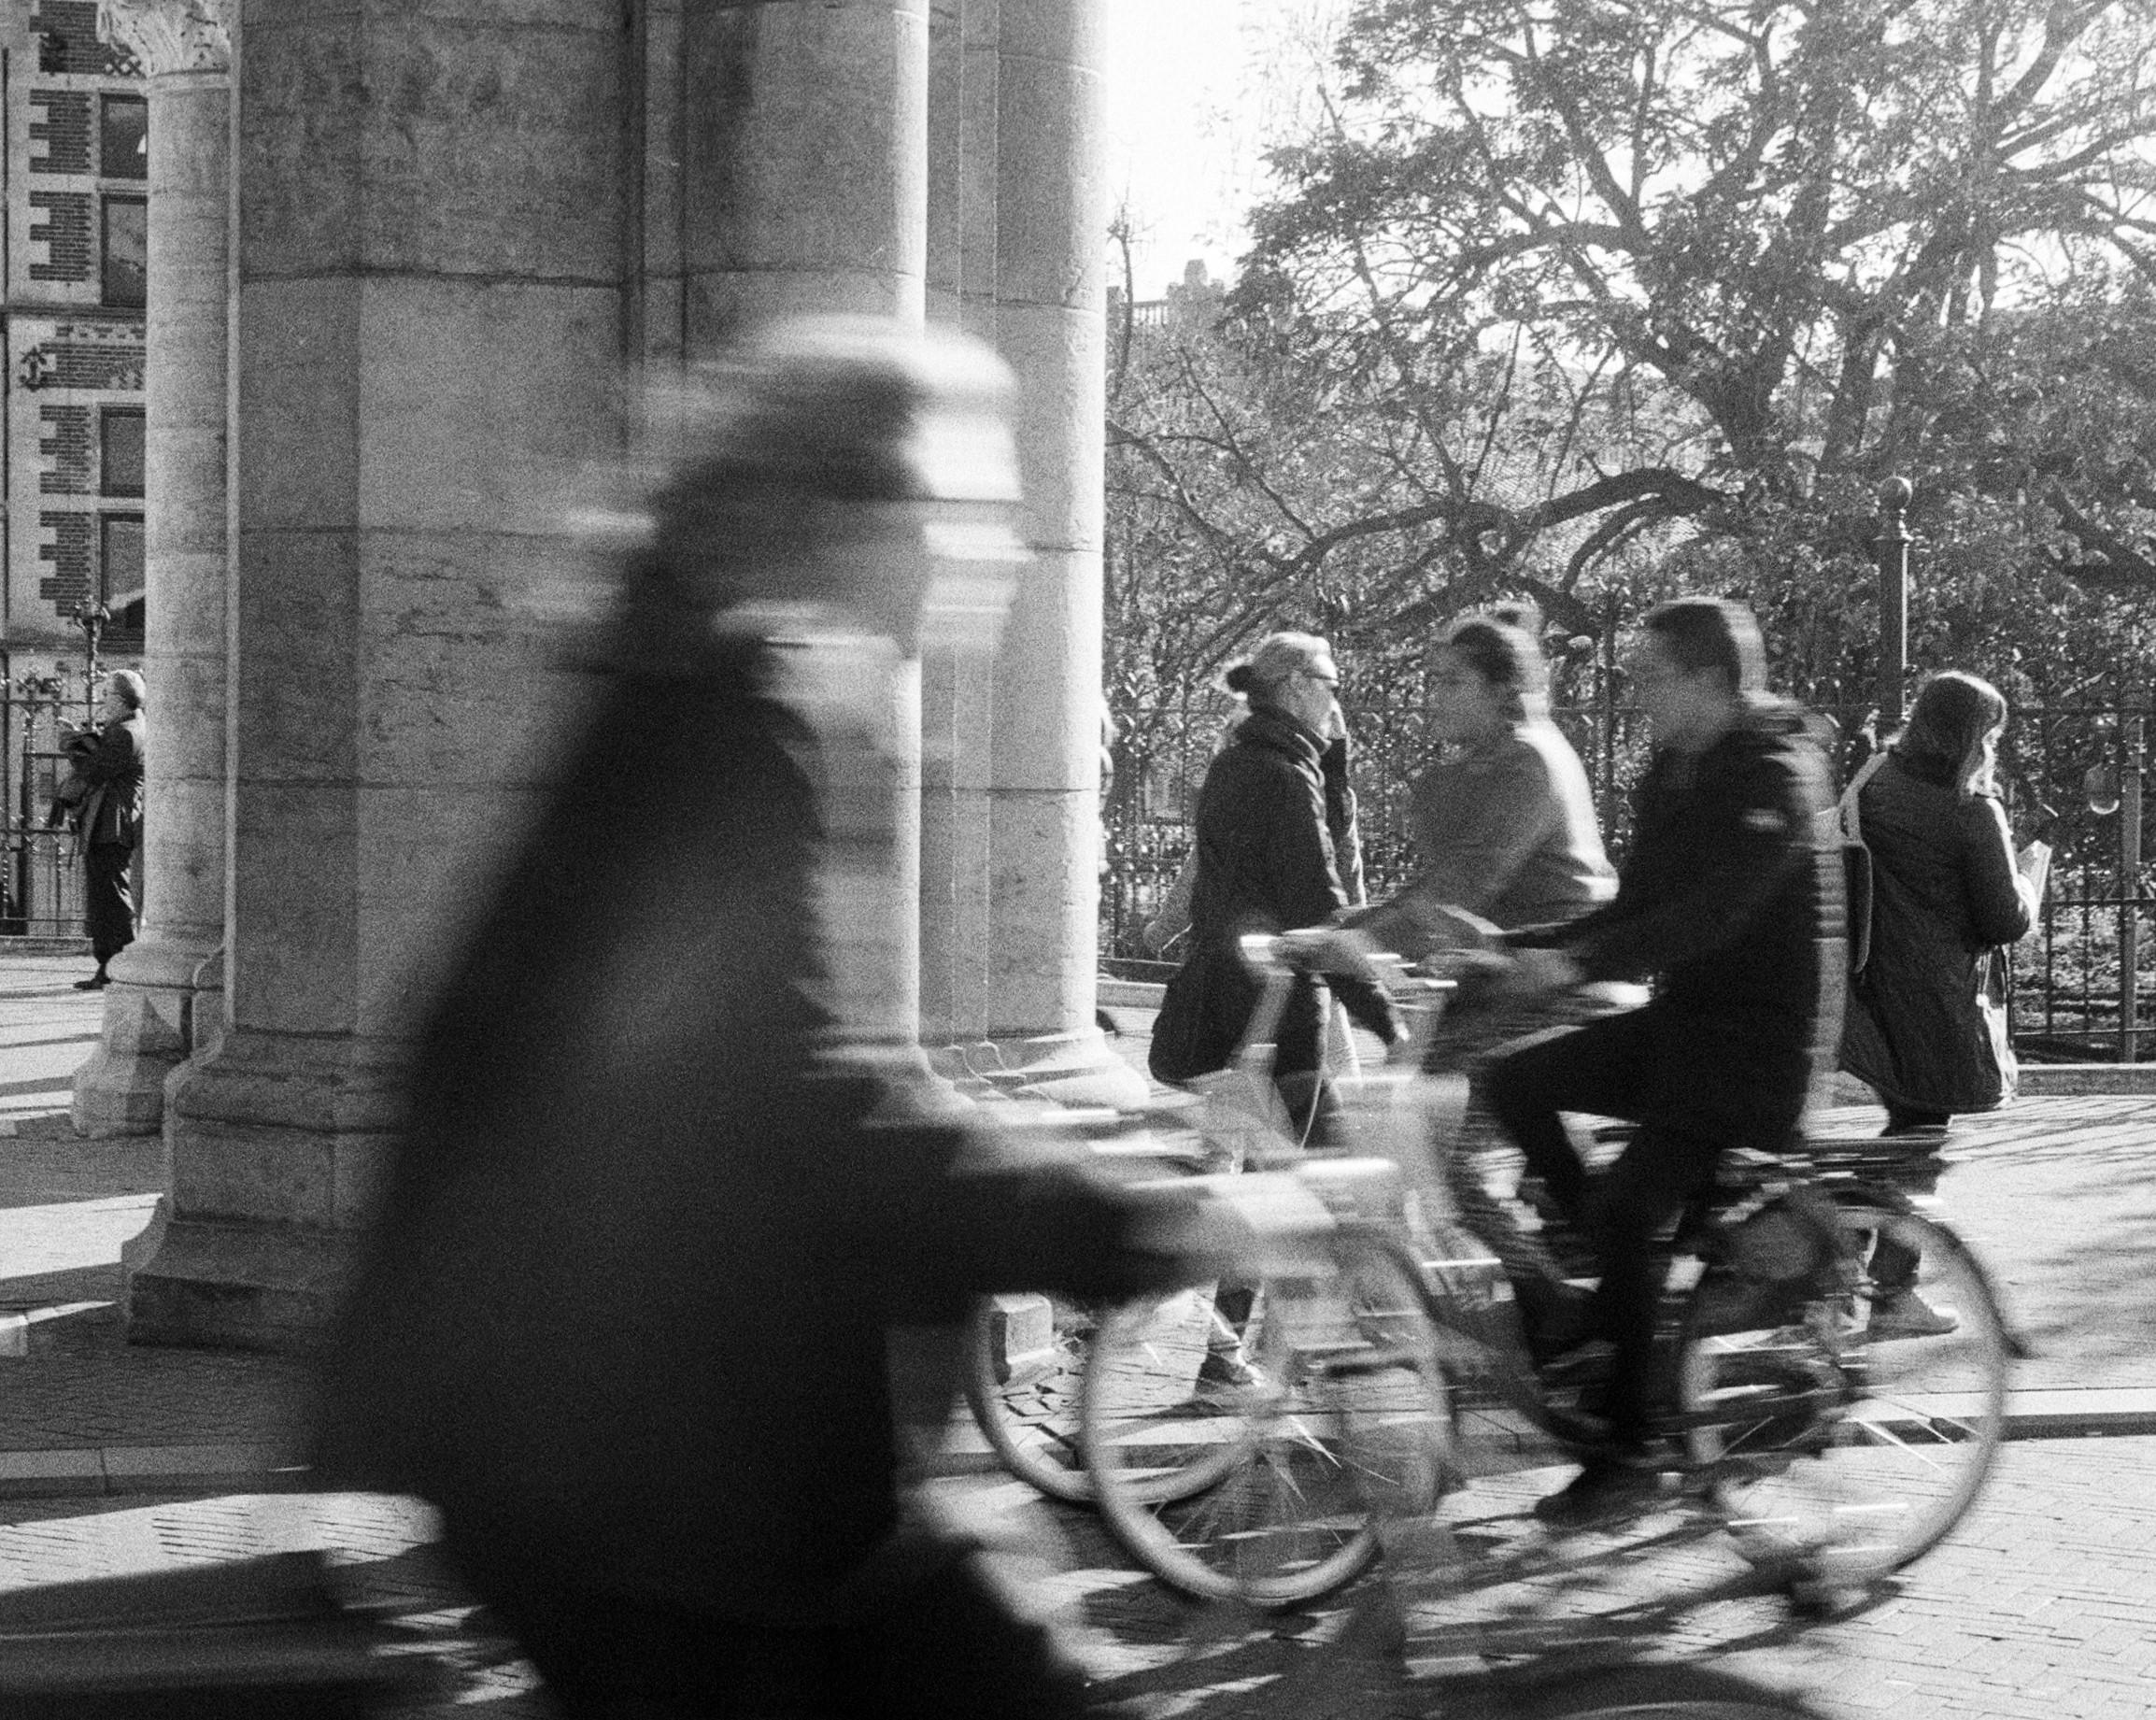 Amsterdam's Street Life